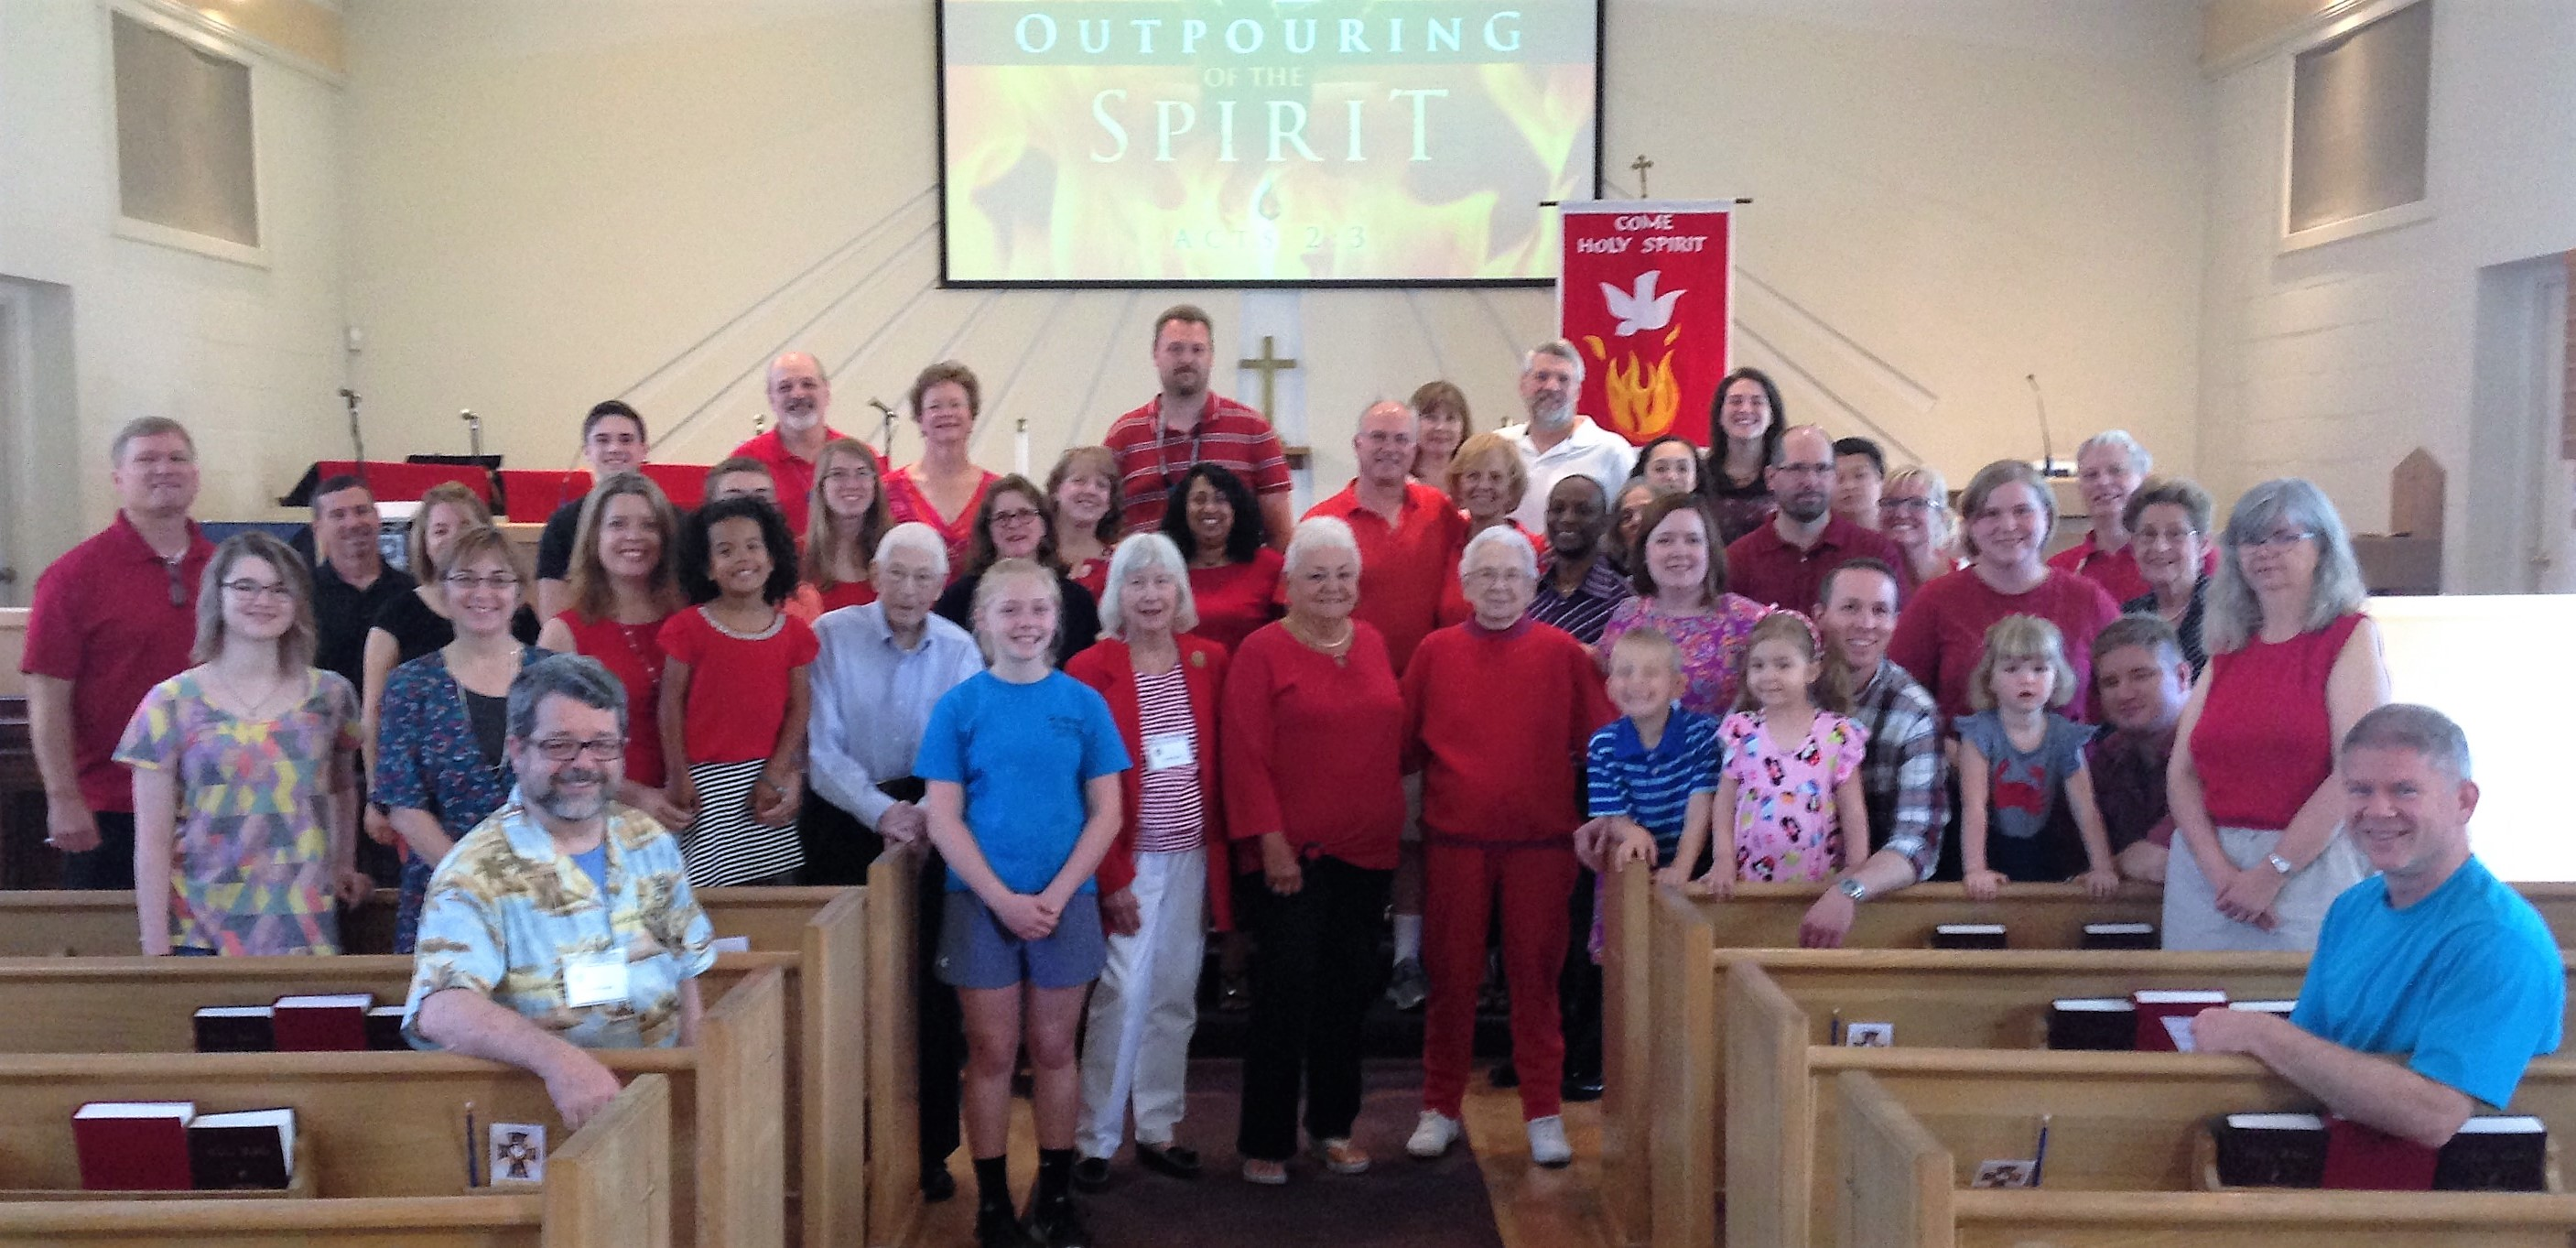 St. Luke's congregation Pentecost 2017